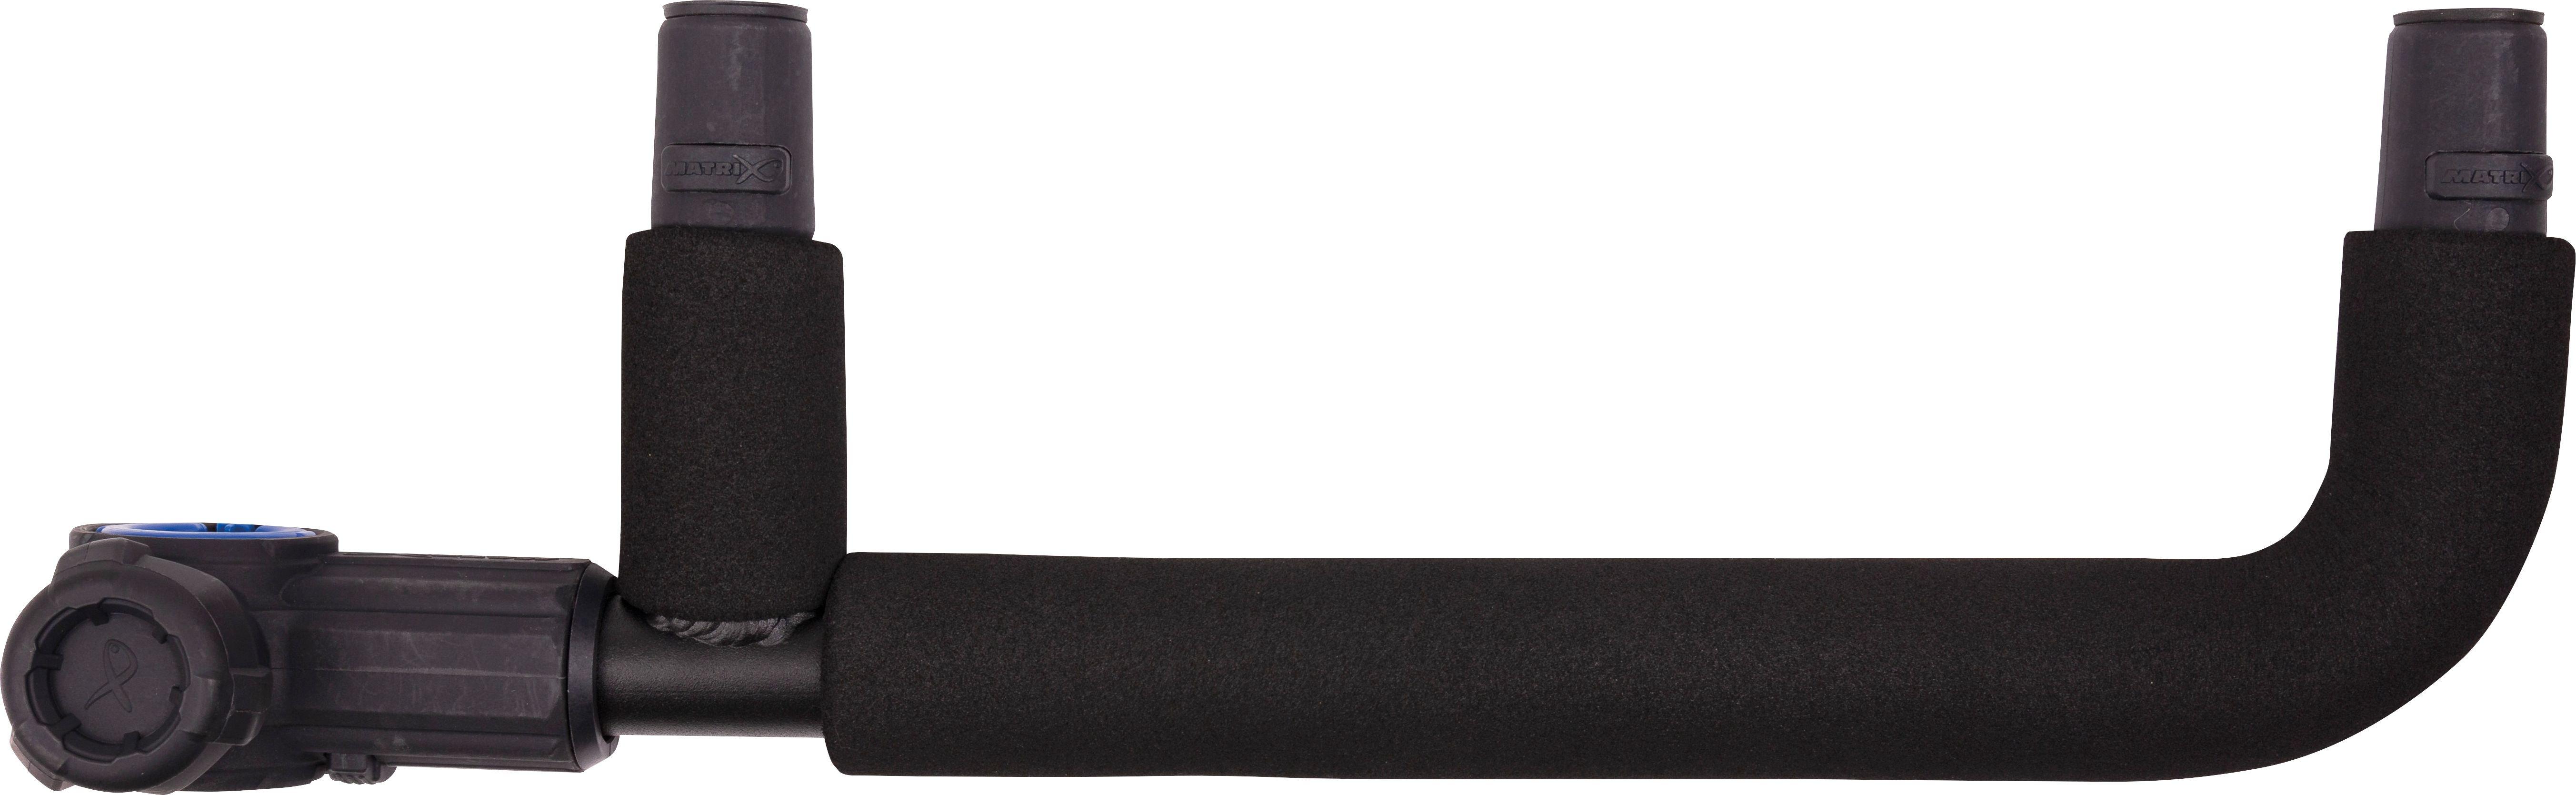 Fox Matrix 3D-R Double Protector Bar - Long 43cm (GBA020)